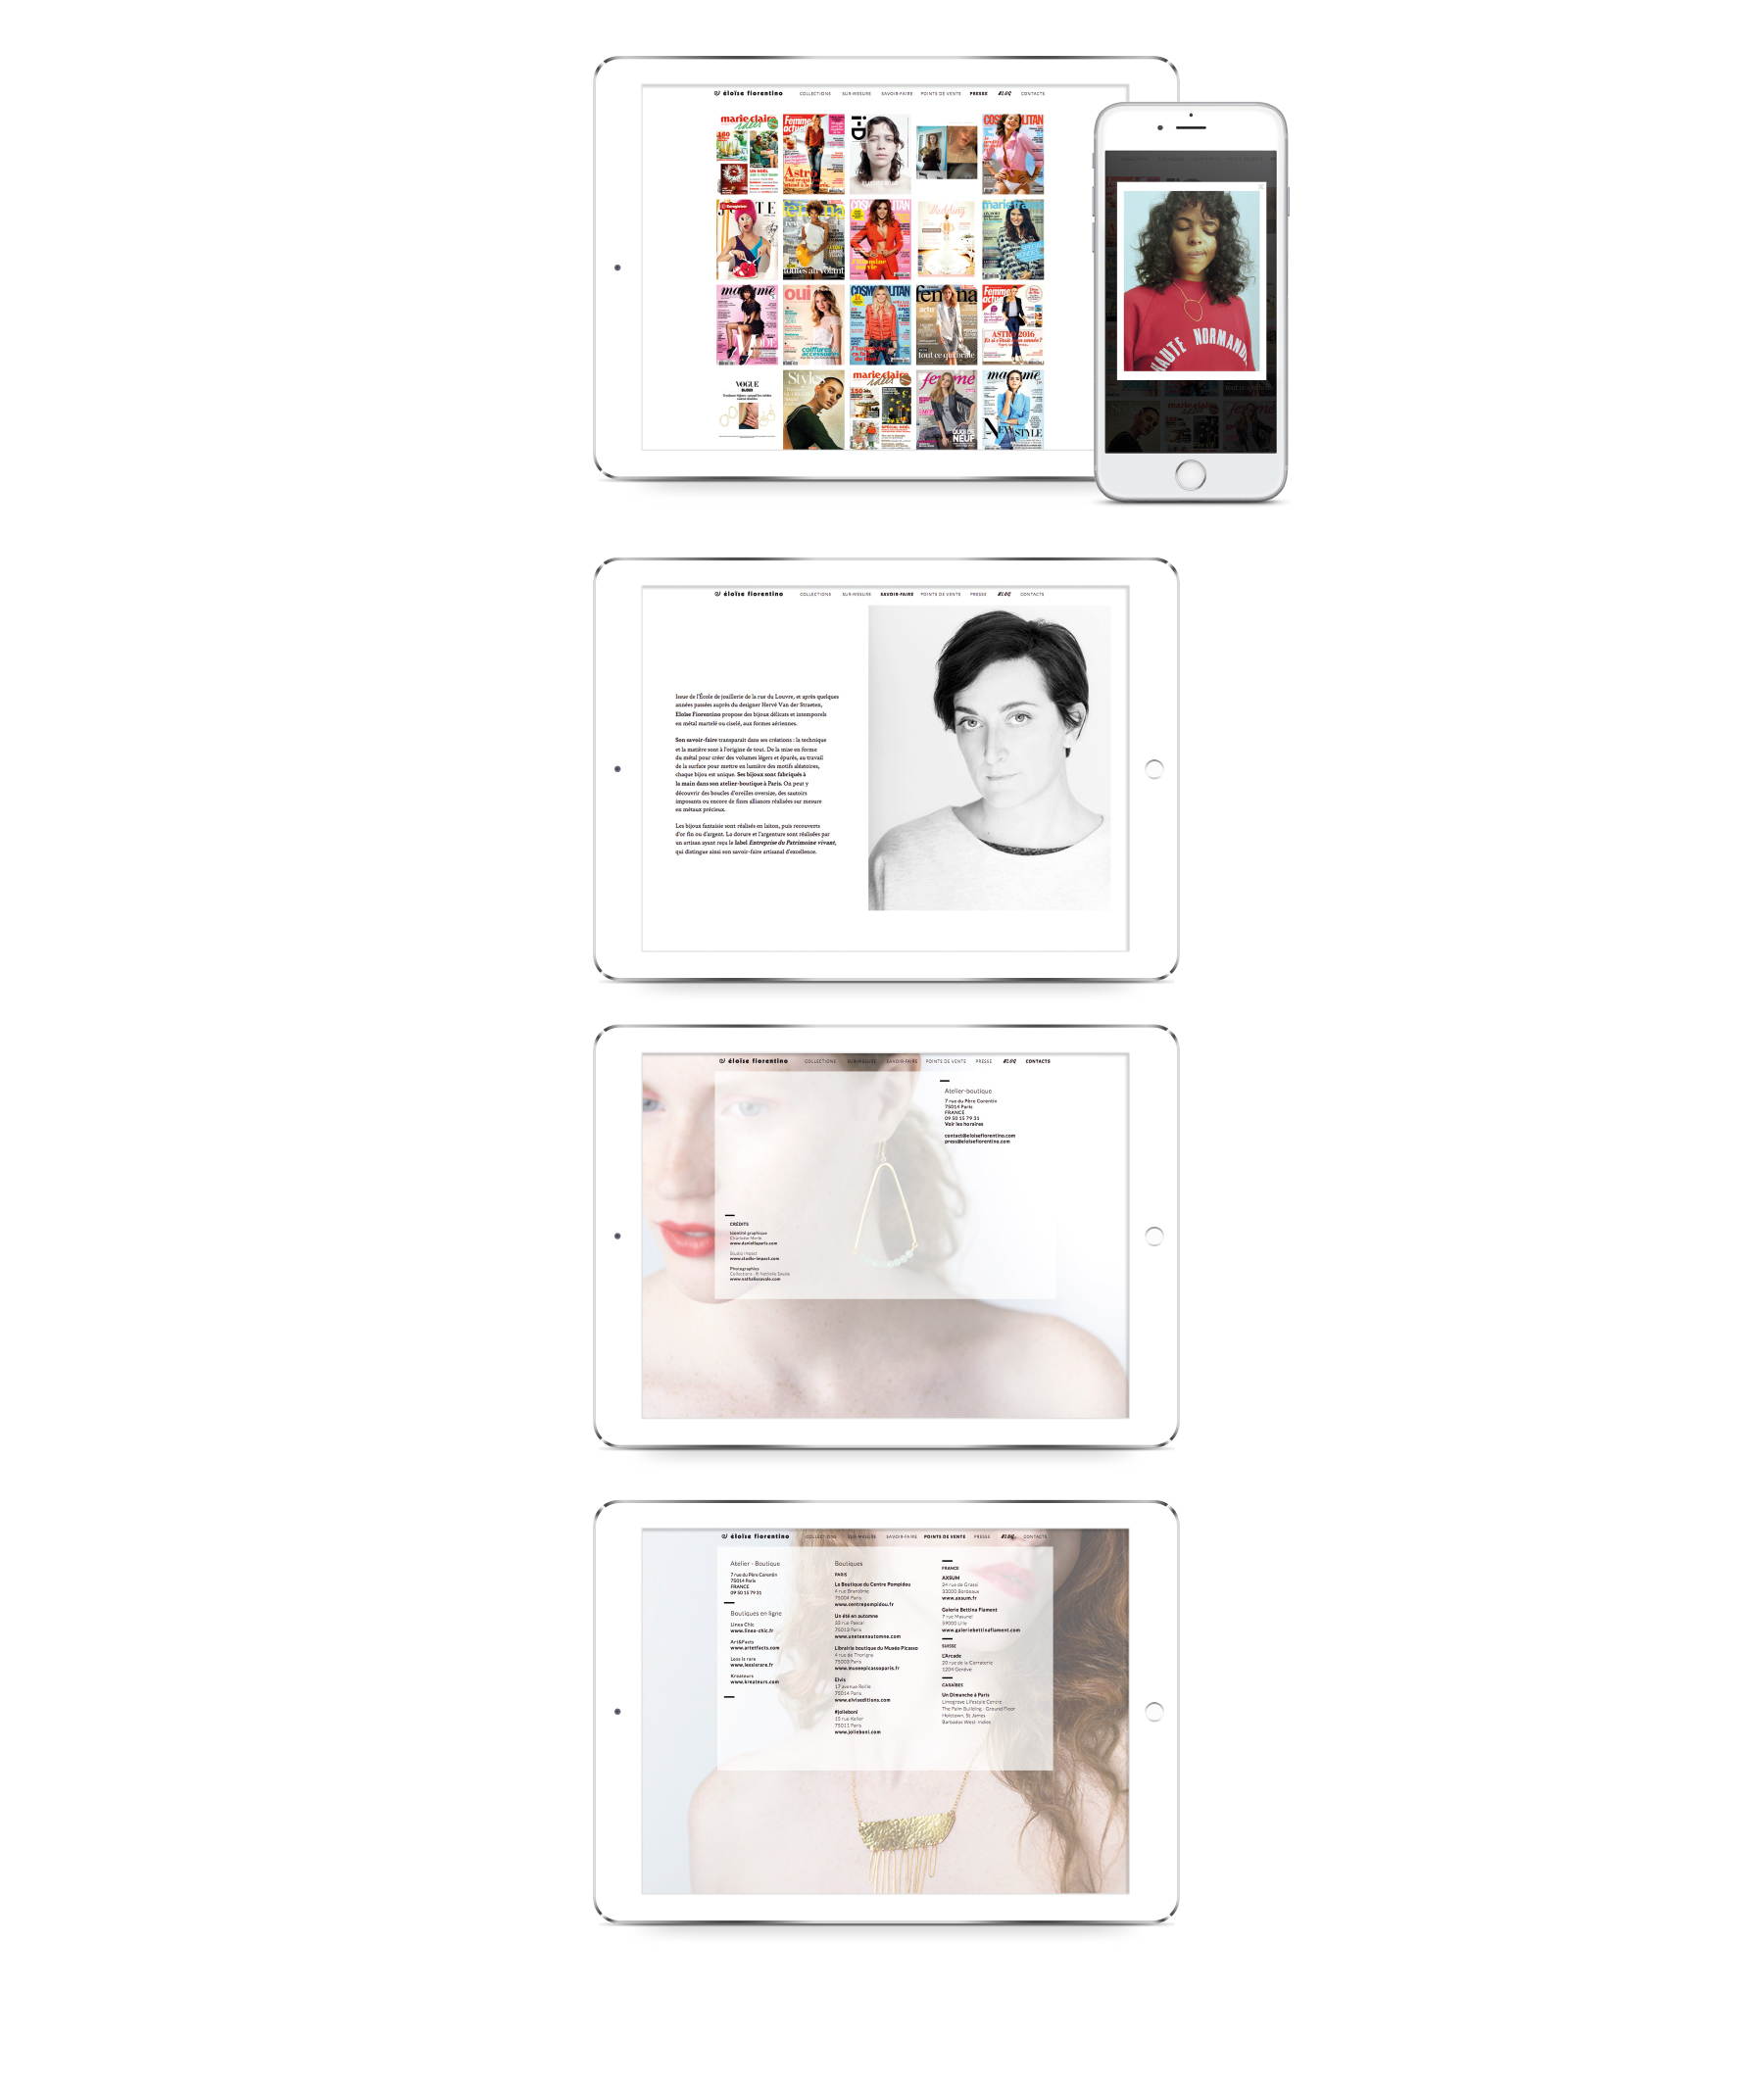 daniella_projets_site_eloise_1-2